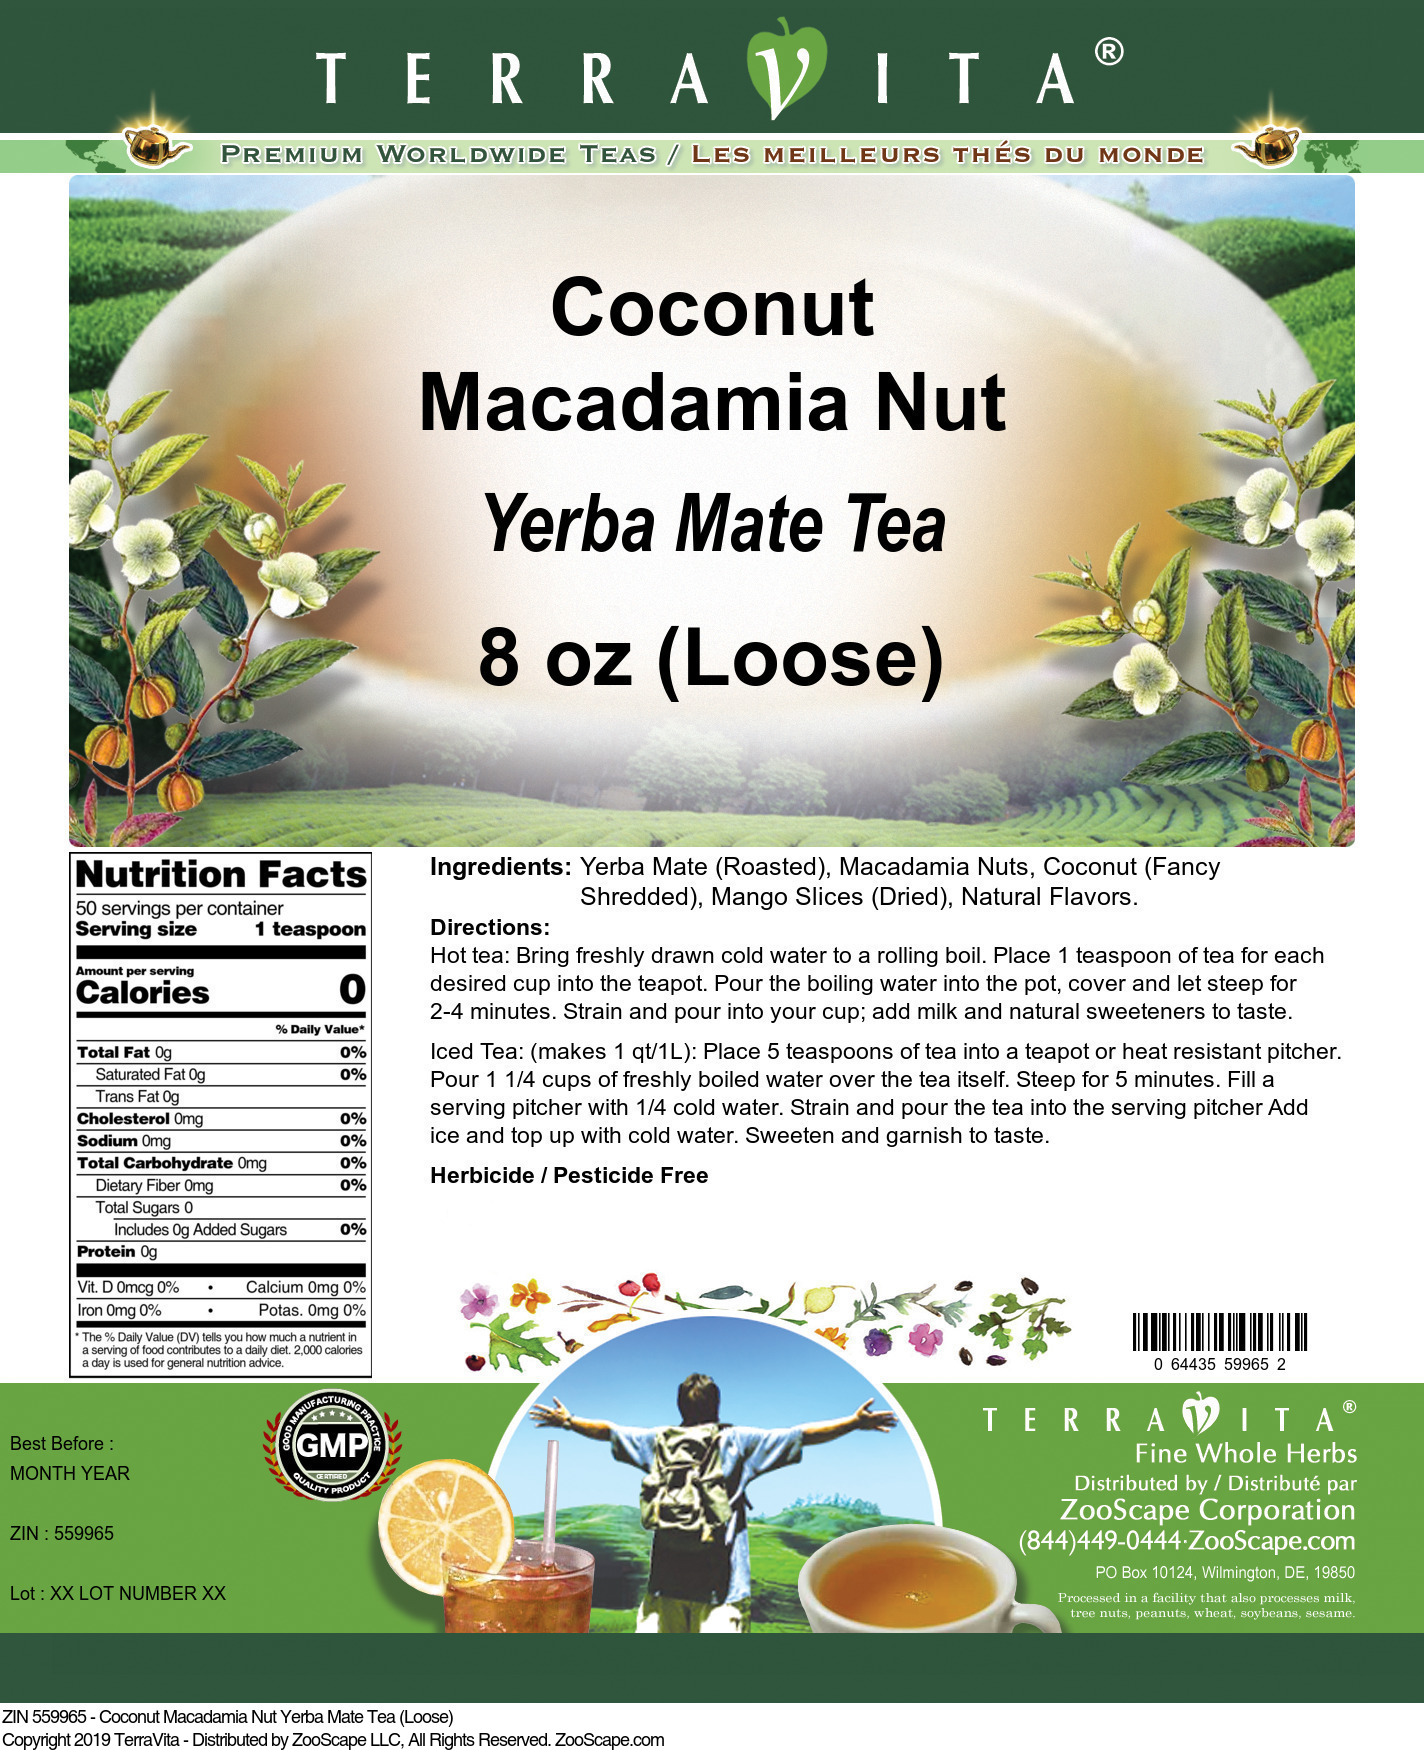 Coconut Macadamia Nut Yerba Mate